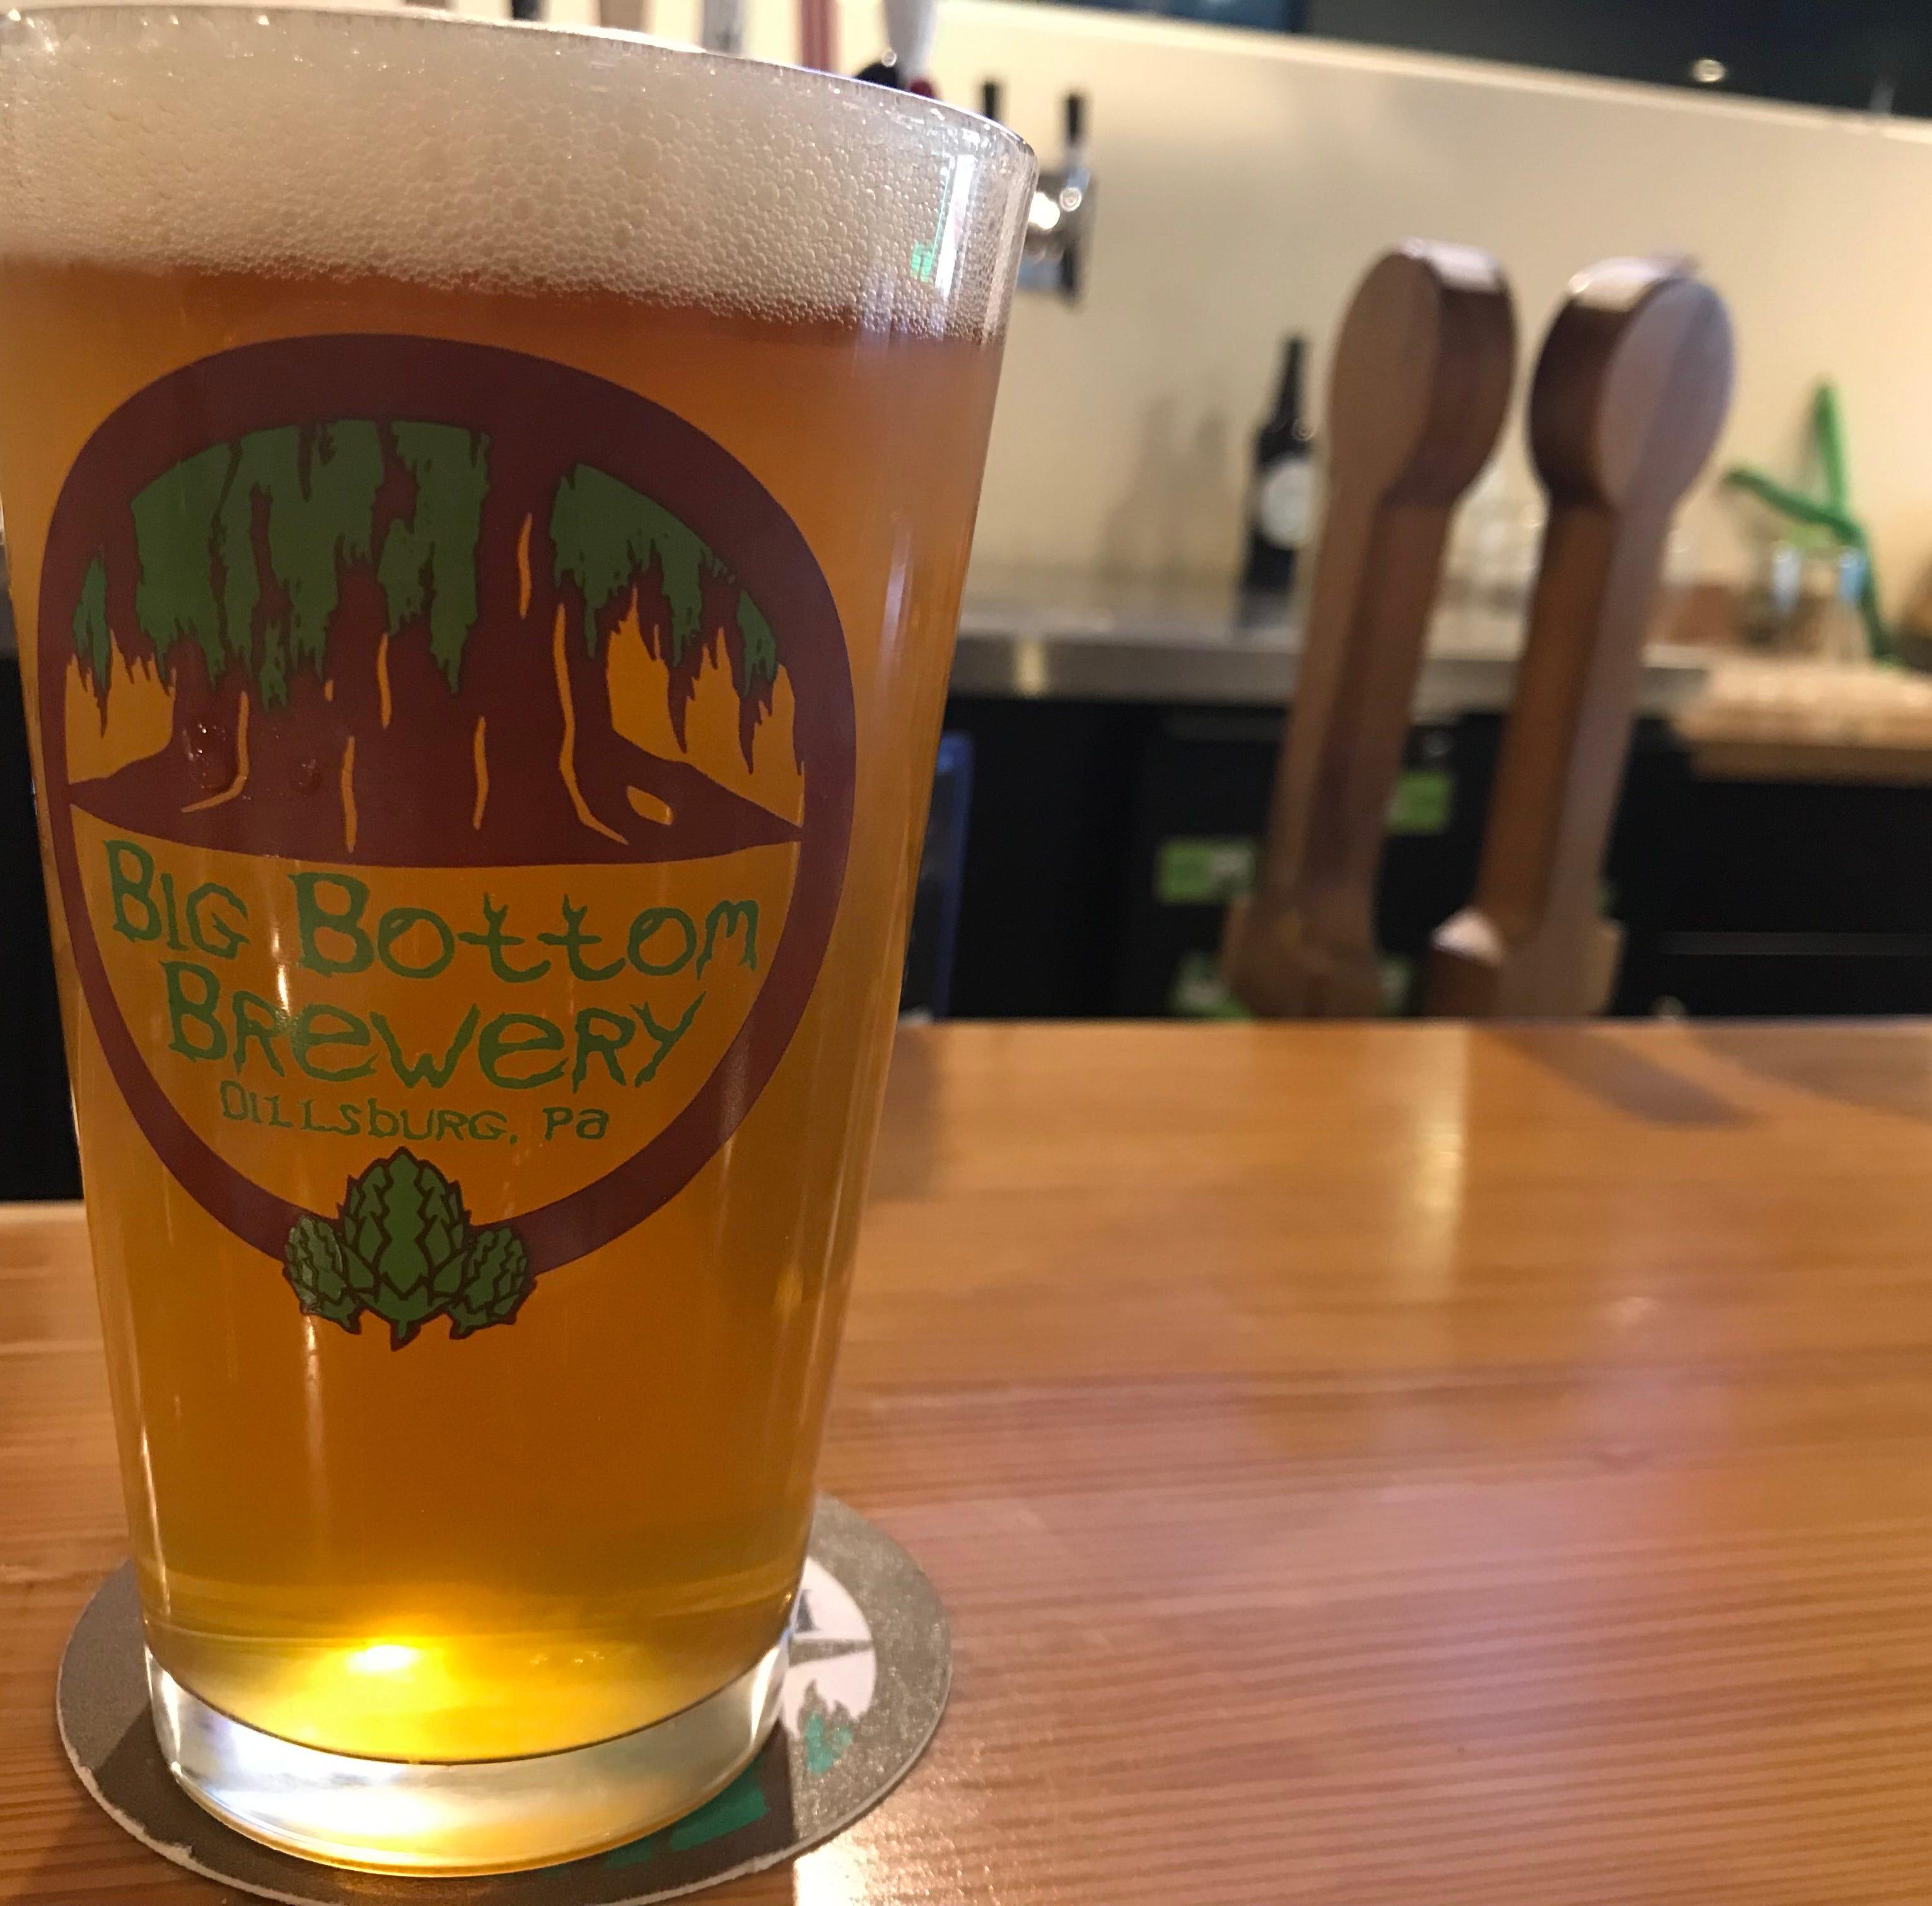 Big Bottom Brewery in Dillsburg, PA.